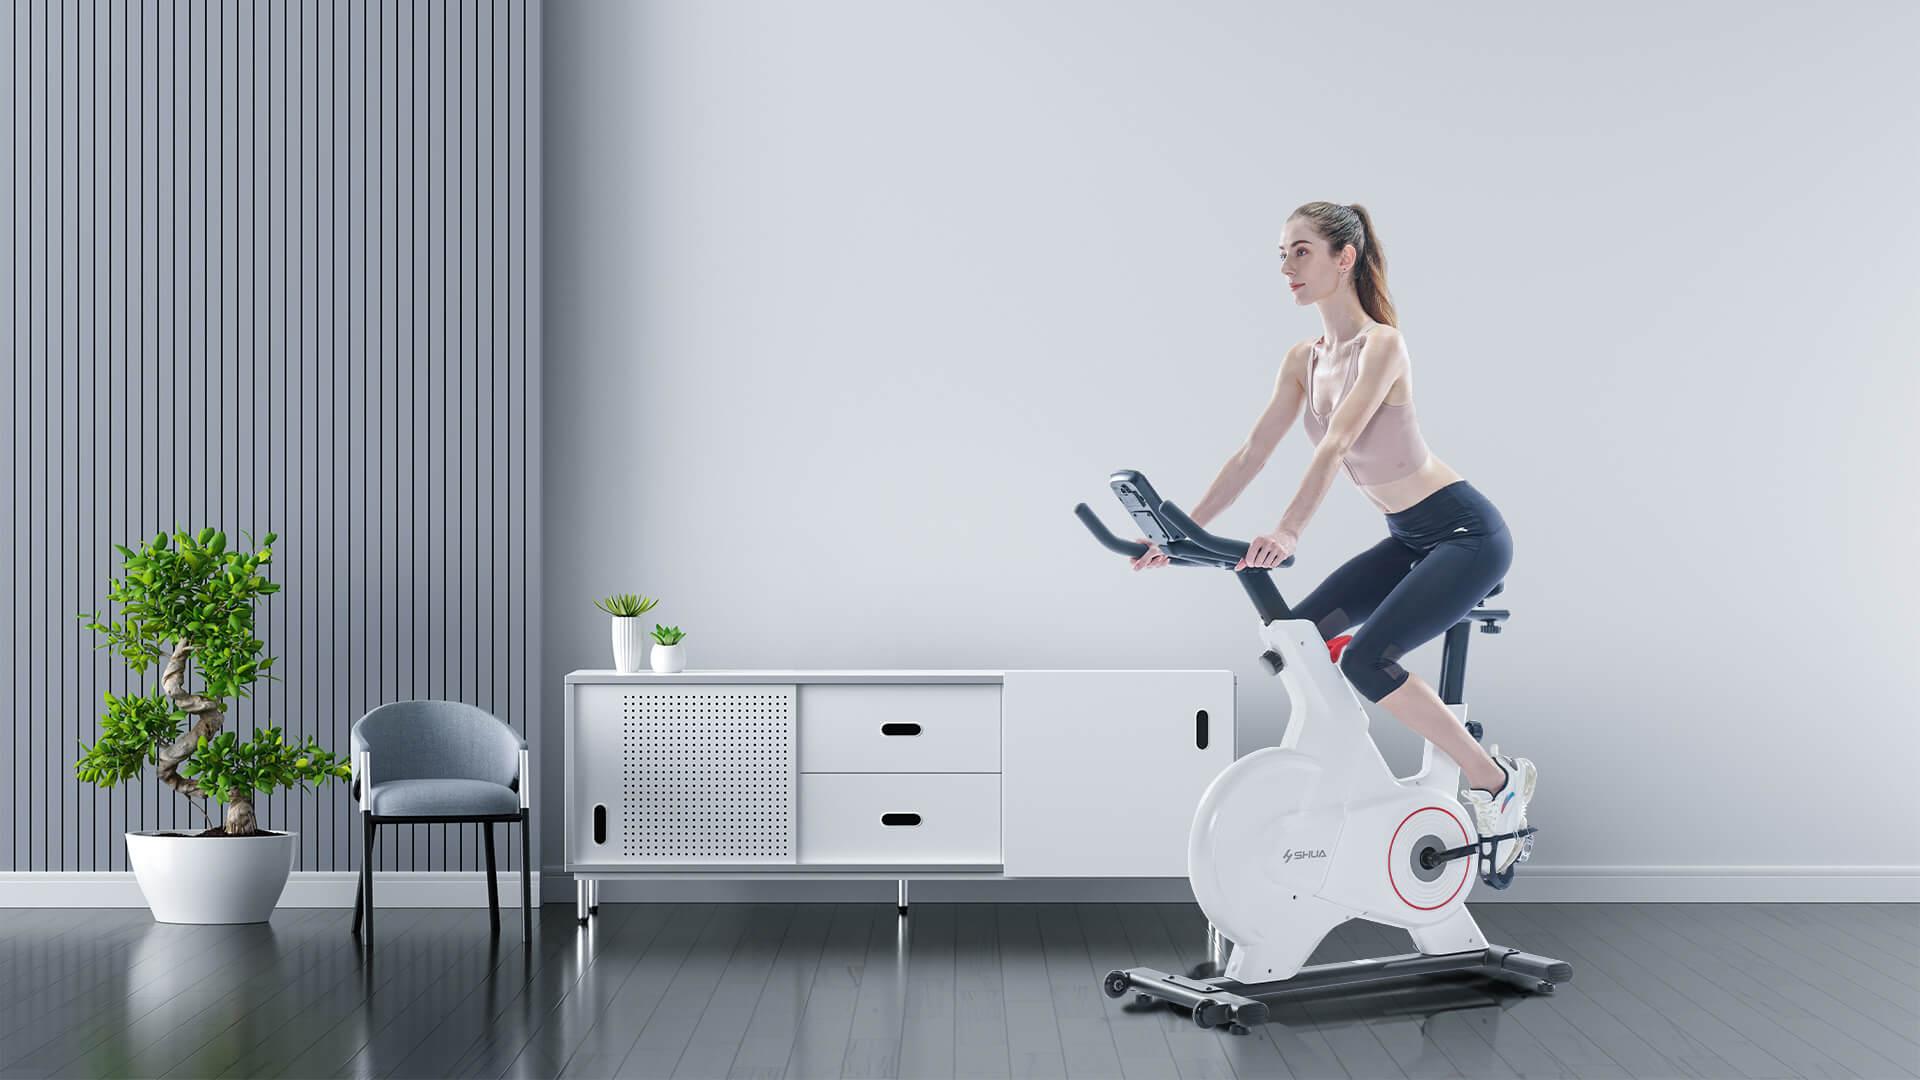 SHUA exercise bike